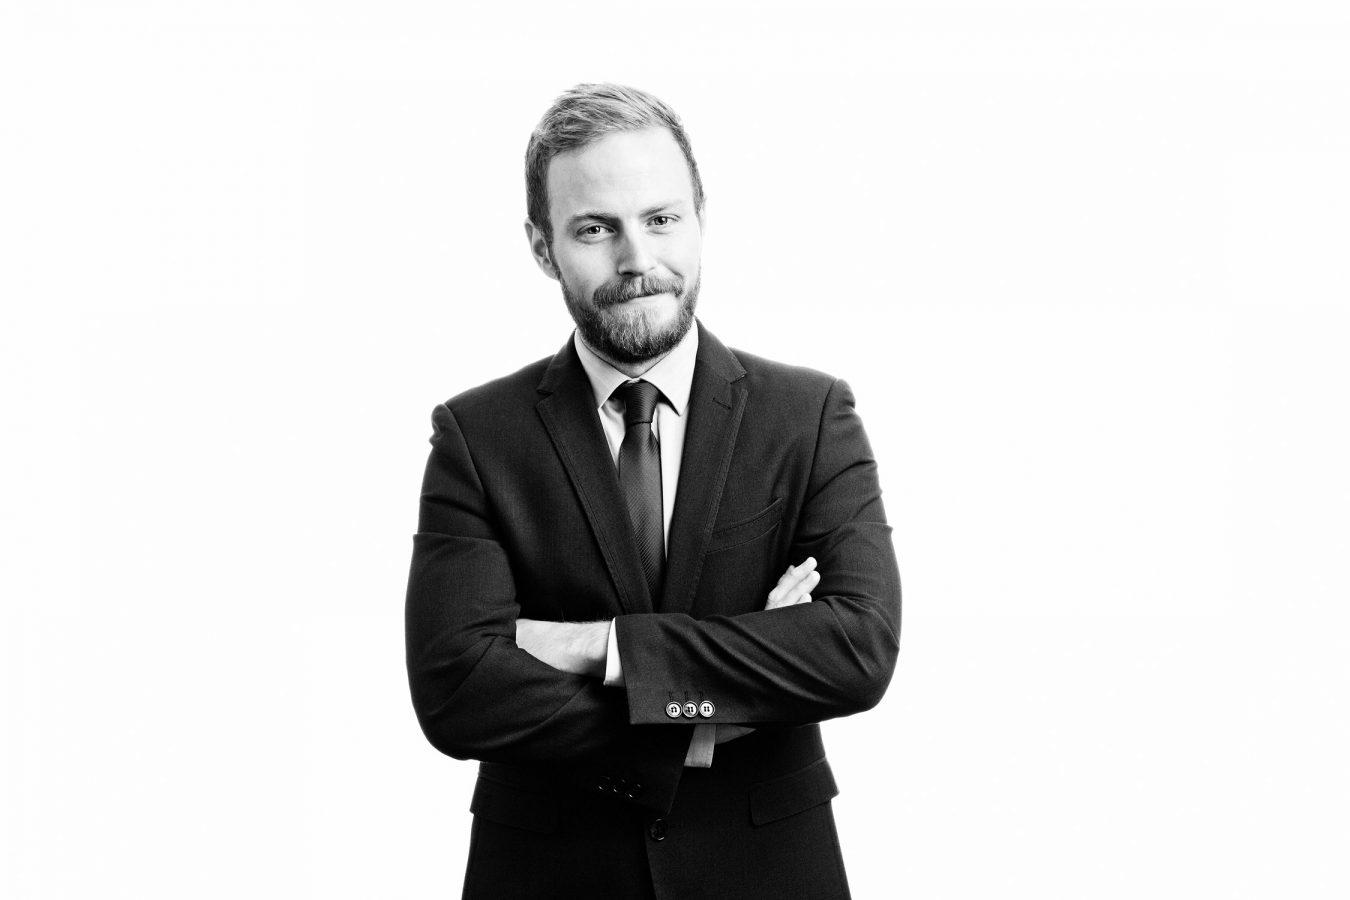 Taylor-Vinters-staff-male-portrait-studio-black-and-white-cambridge